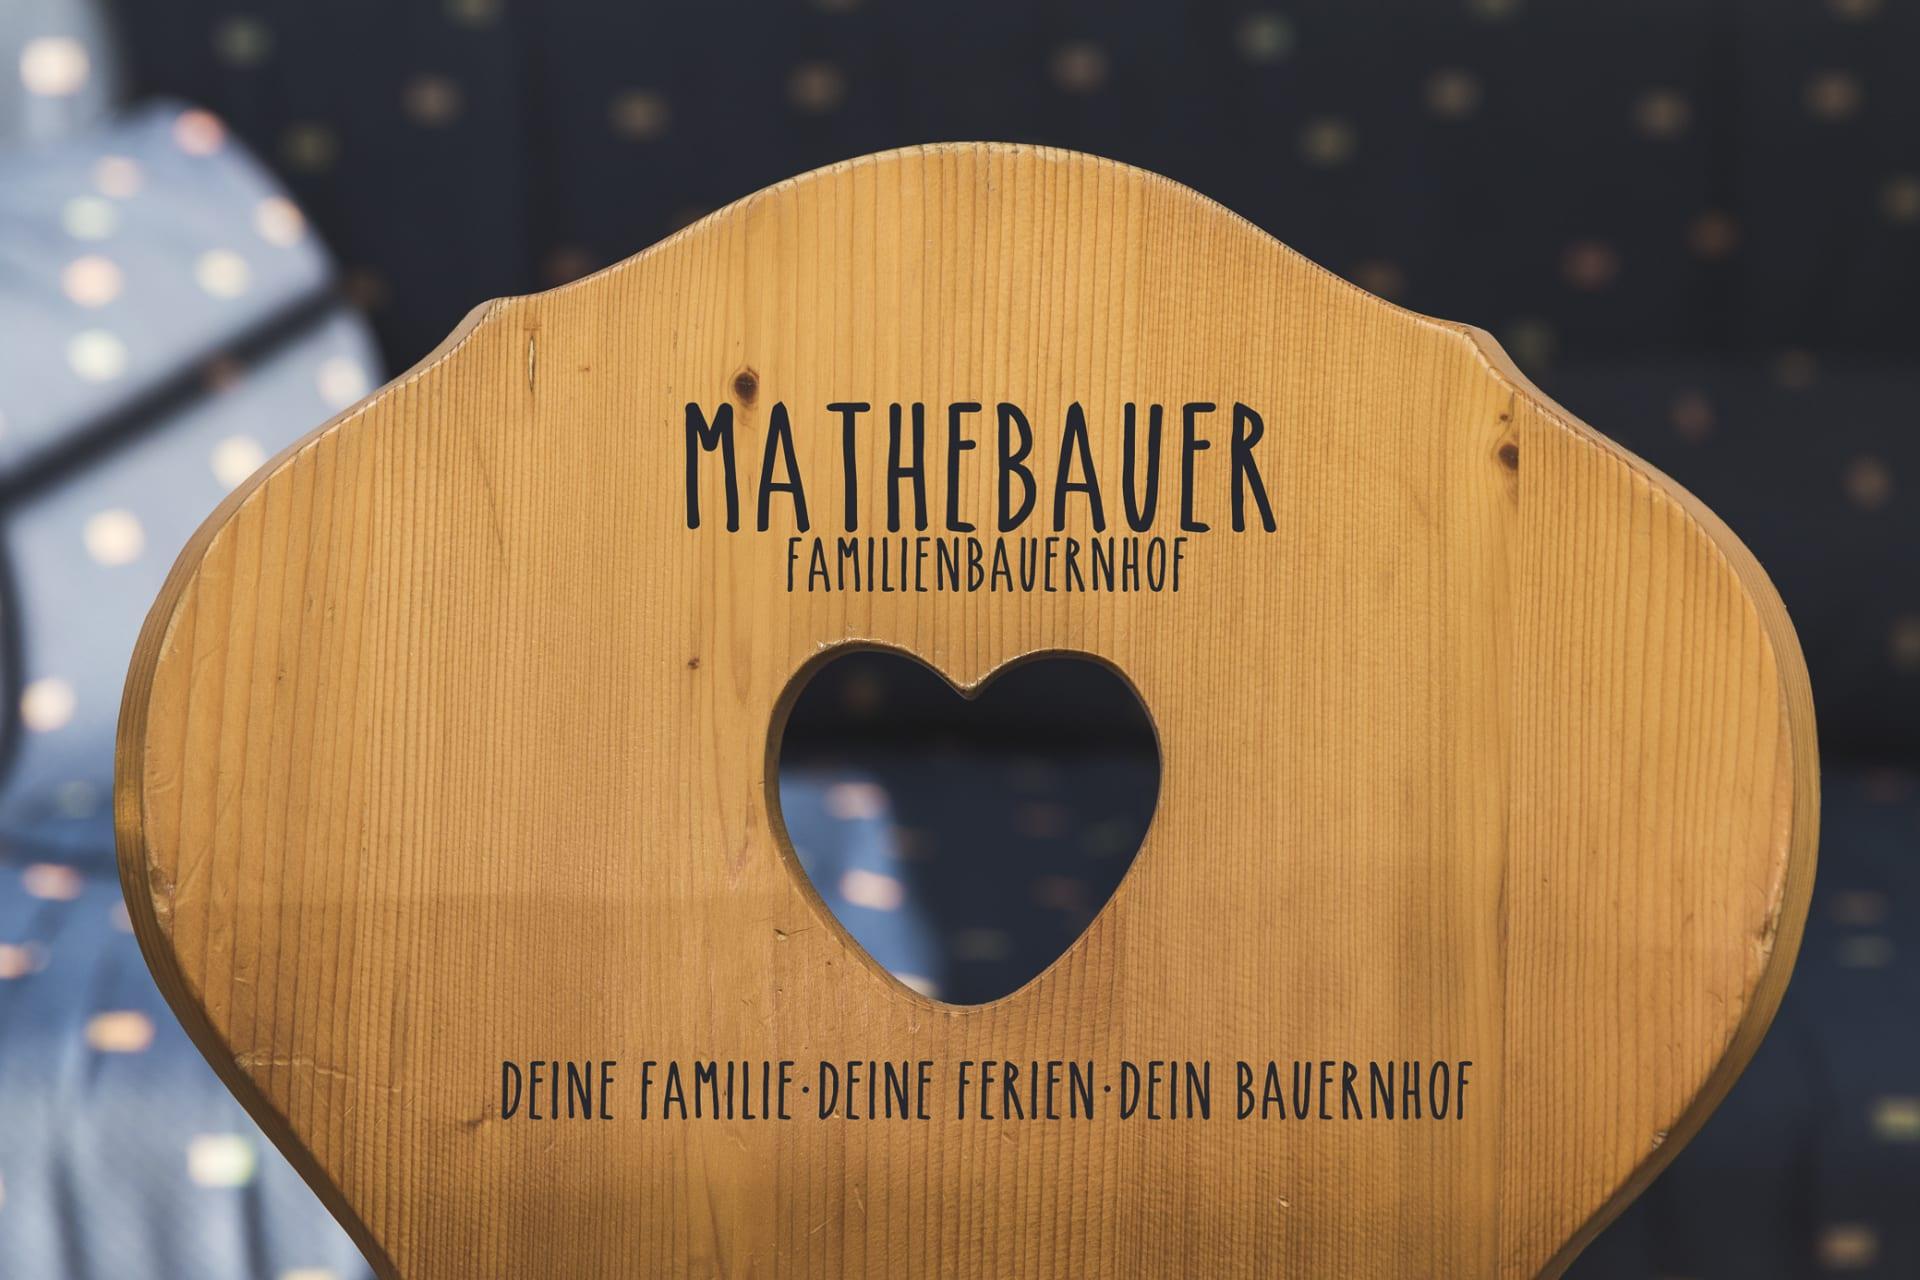 Mathebauer